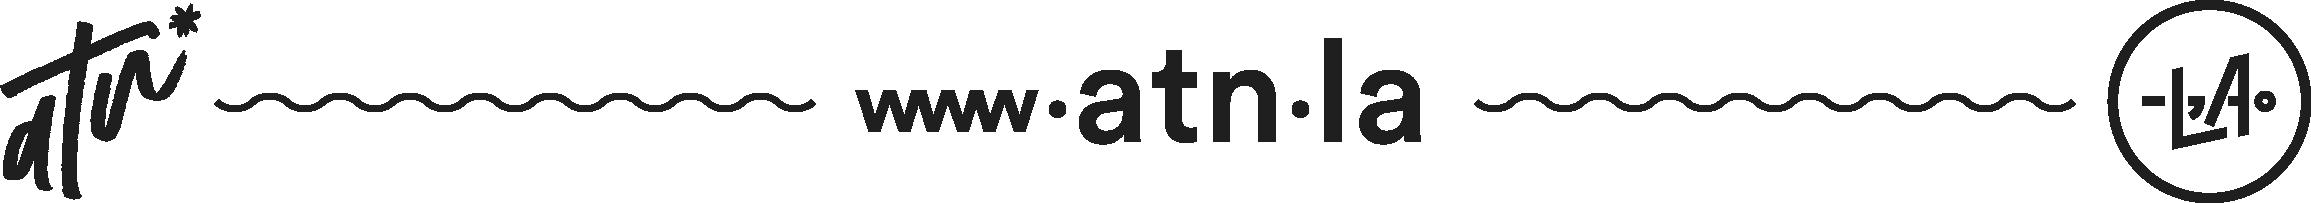 desktop_header